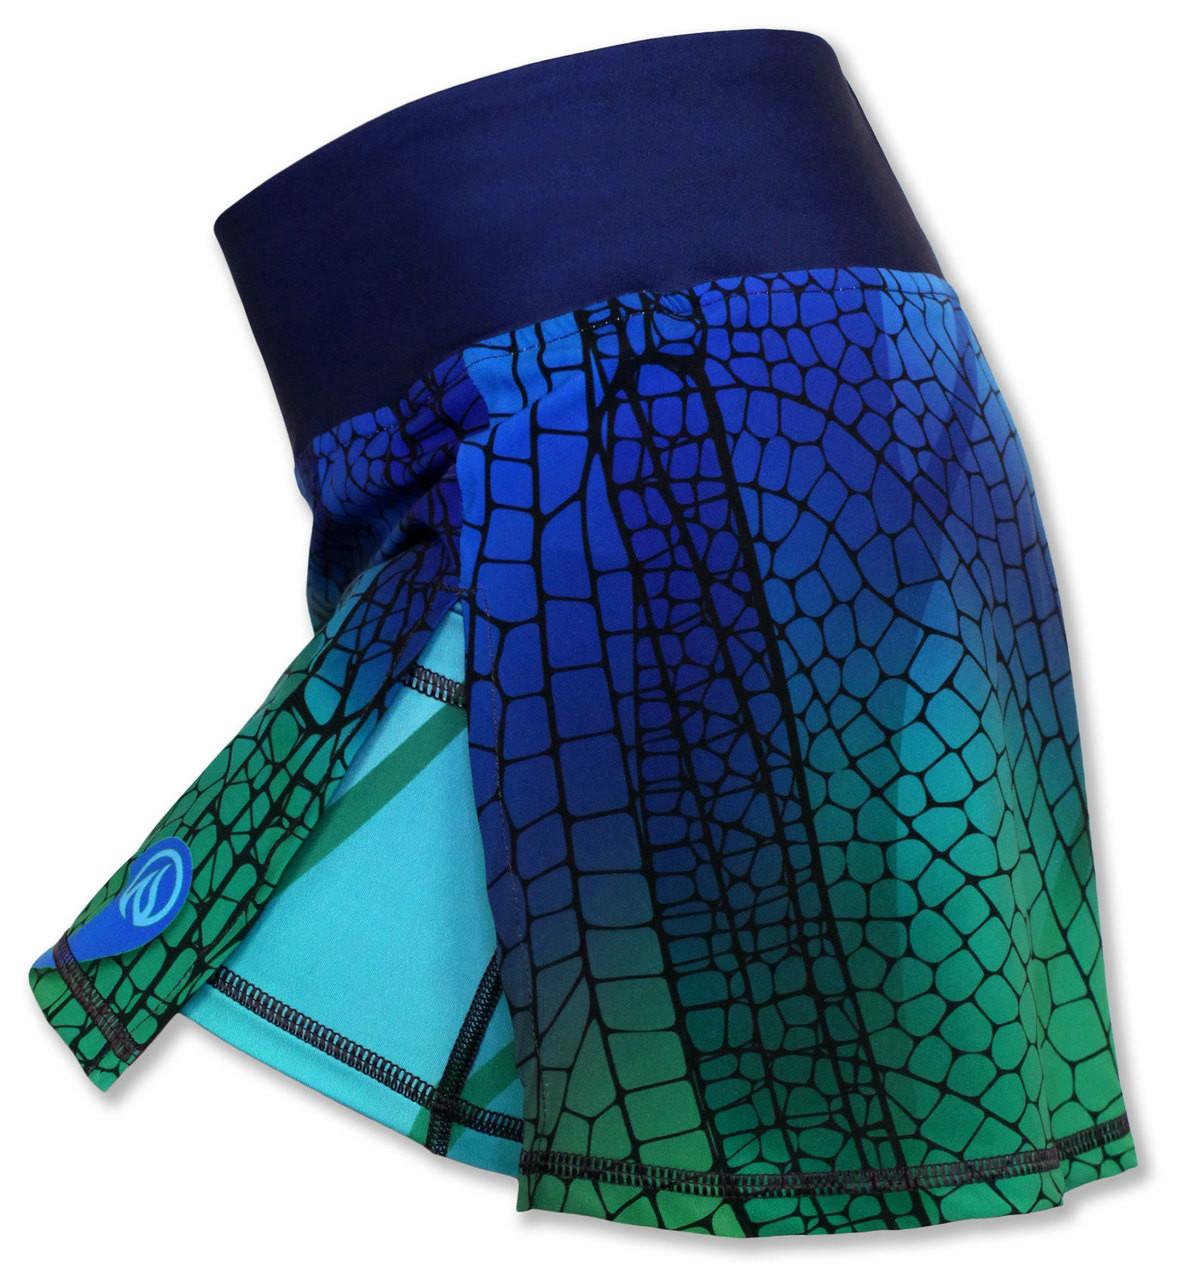 INKnBURN Dragonfly Sports Skirt Side